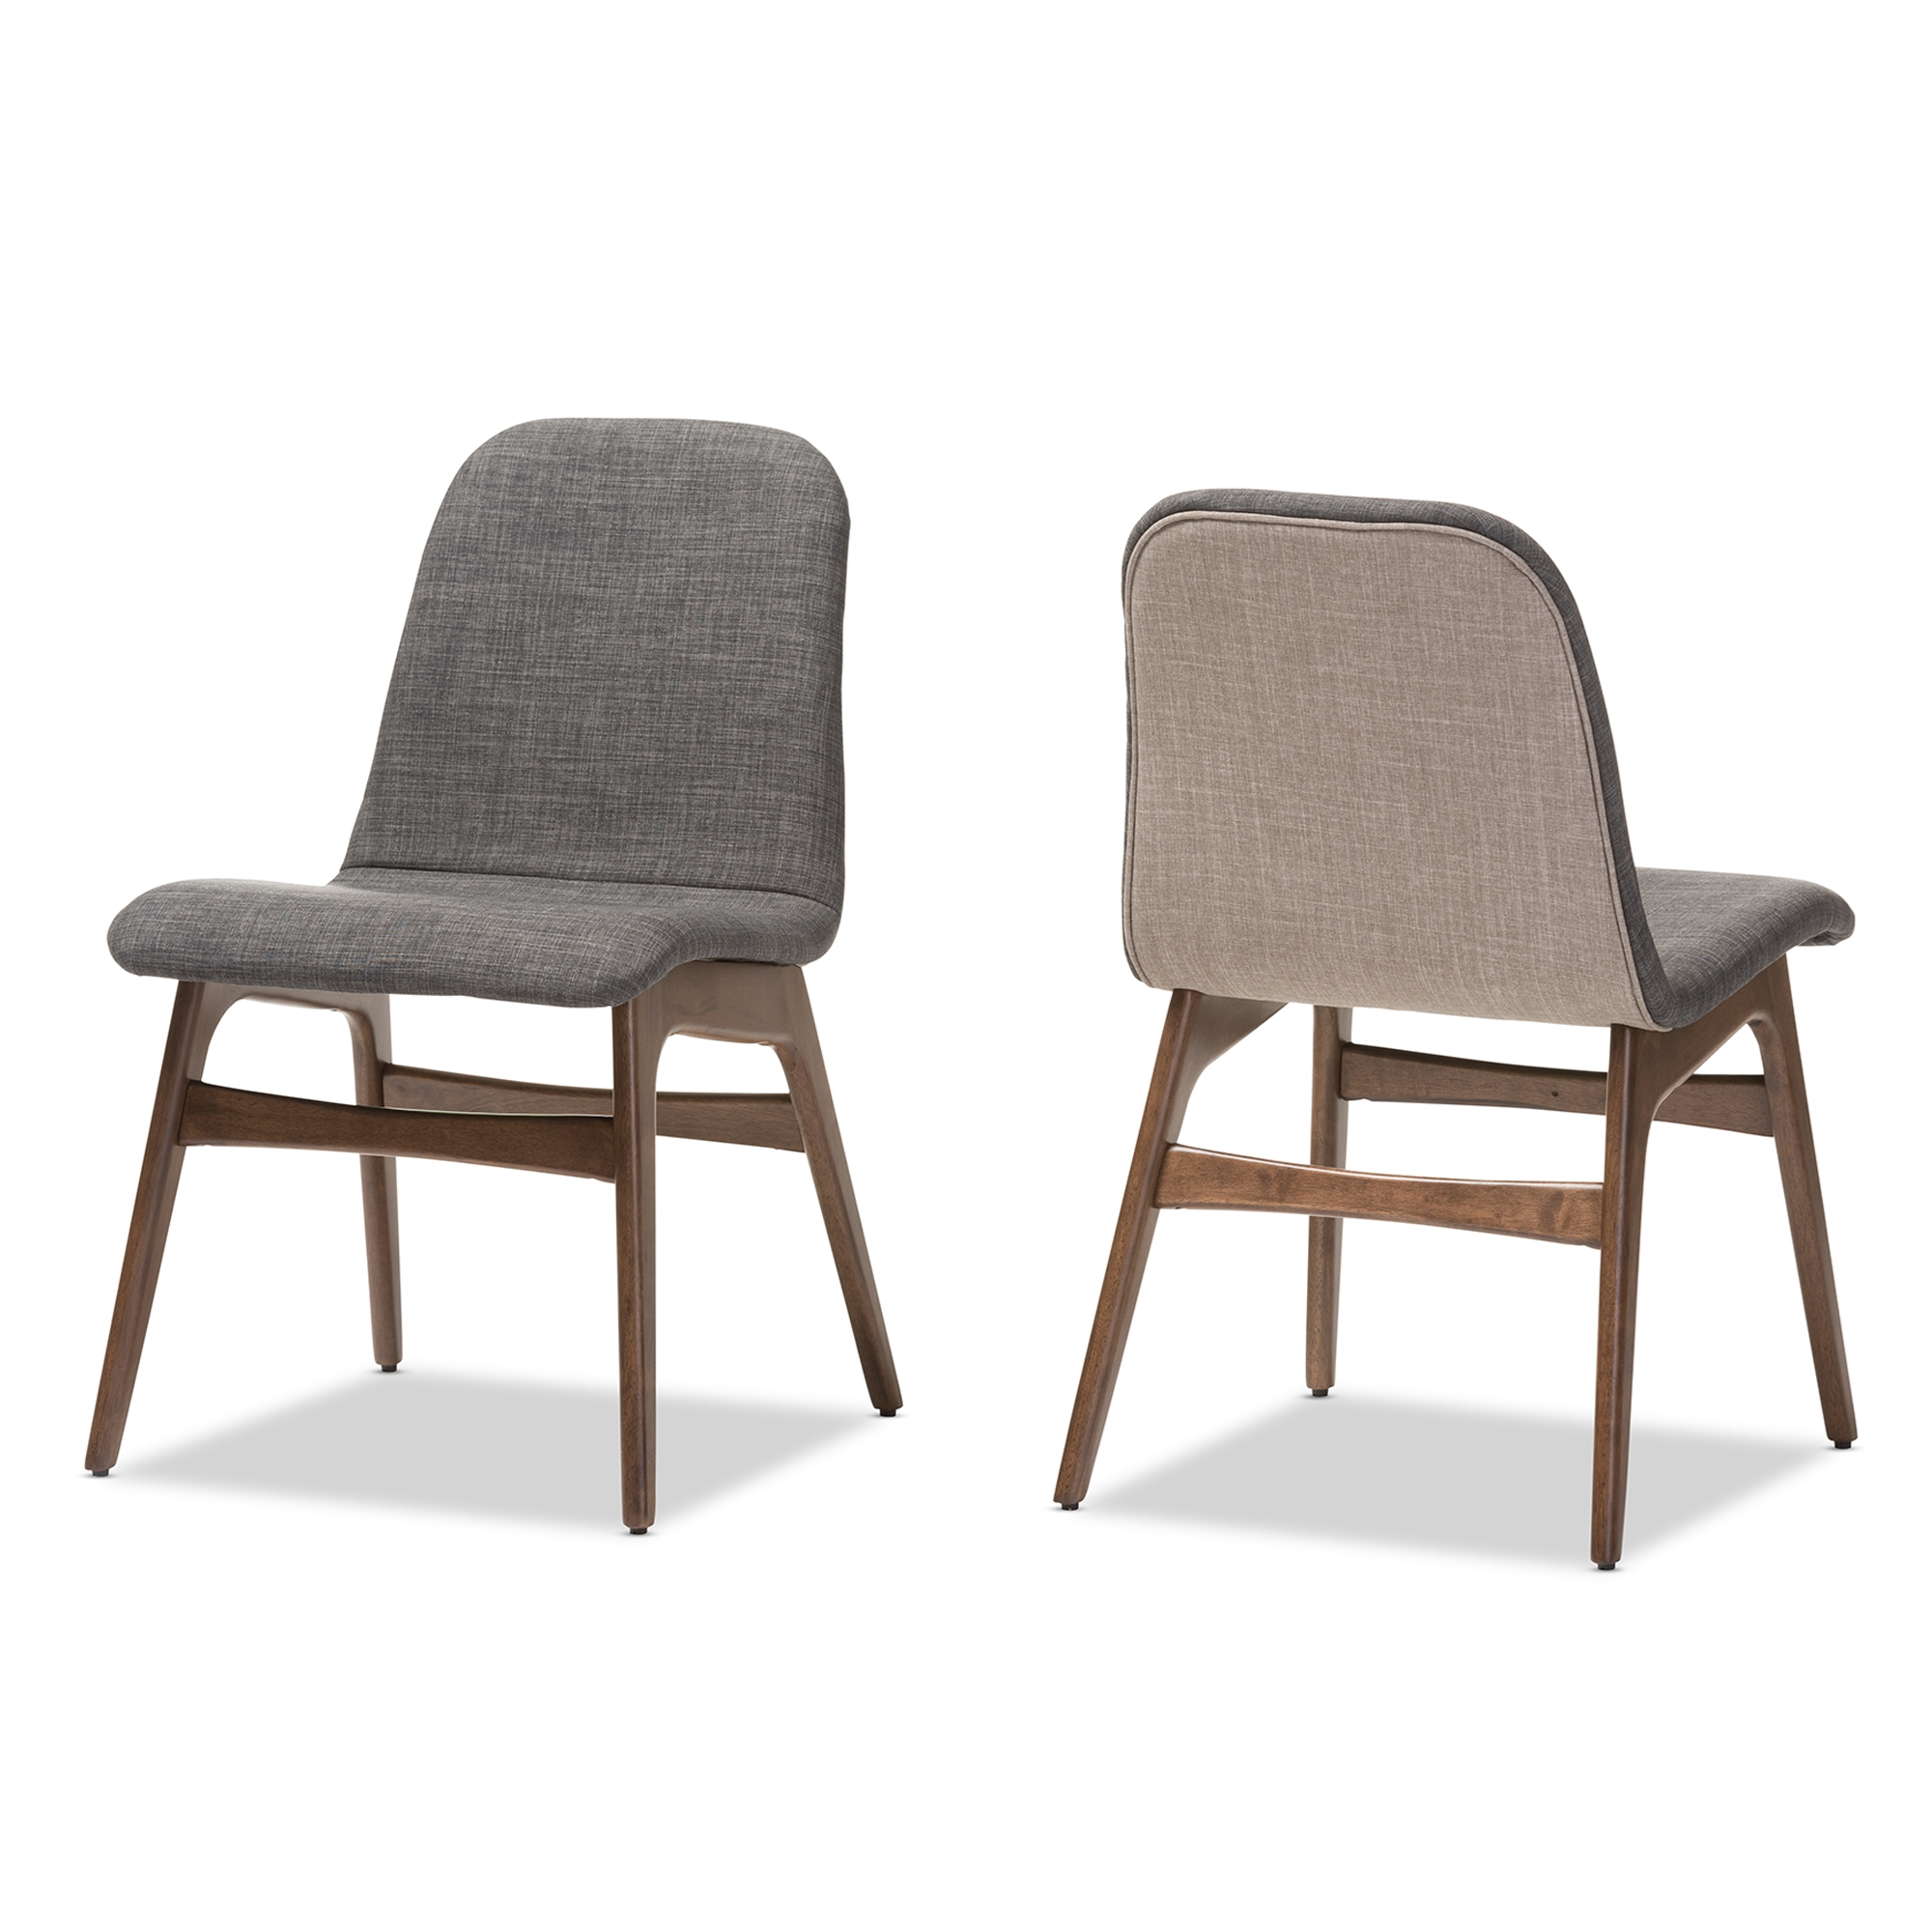 scandinavian furniture style. baxton studio embrace midcentury retro modern scandinavian style dark grey fabric upholstered walnut wood furniture s